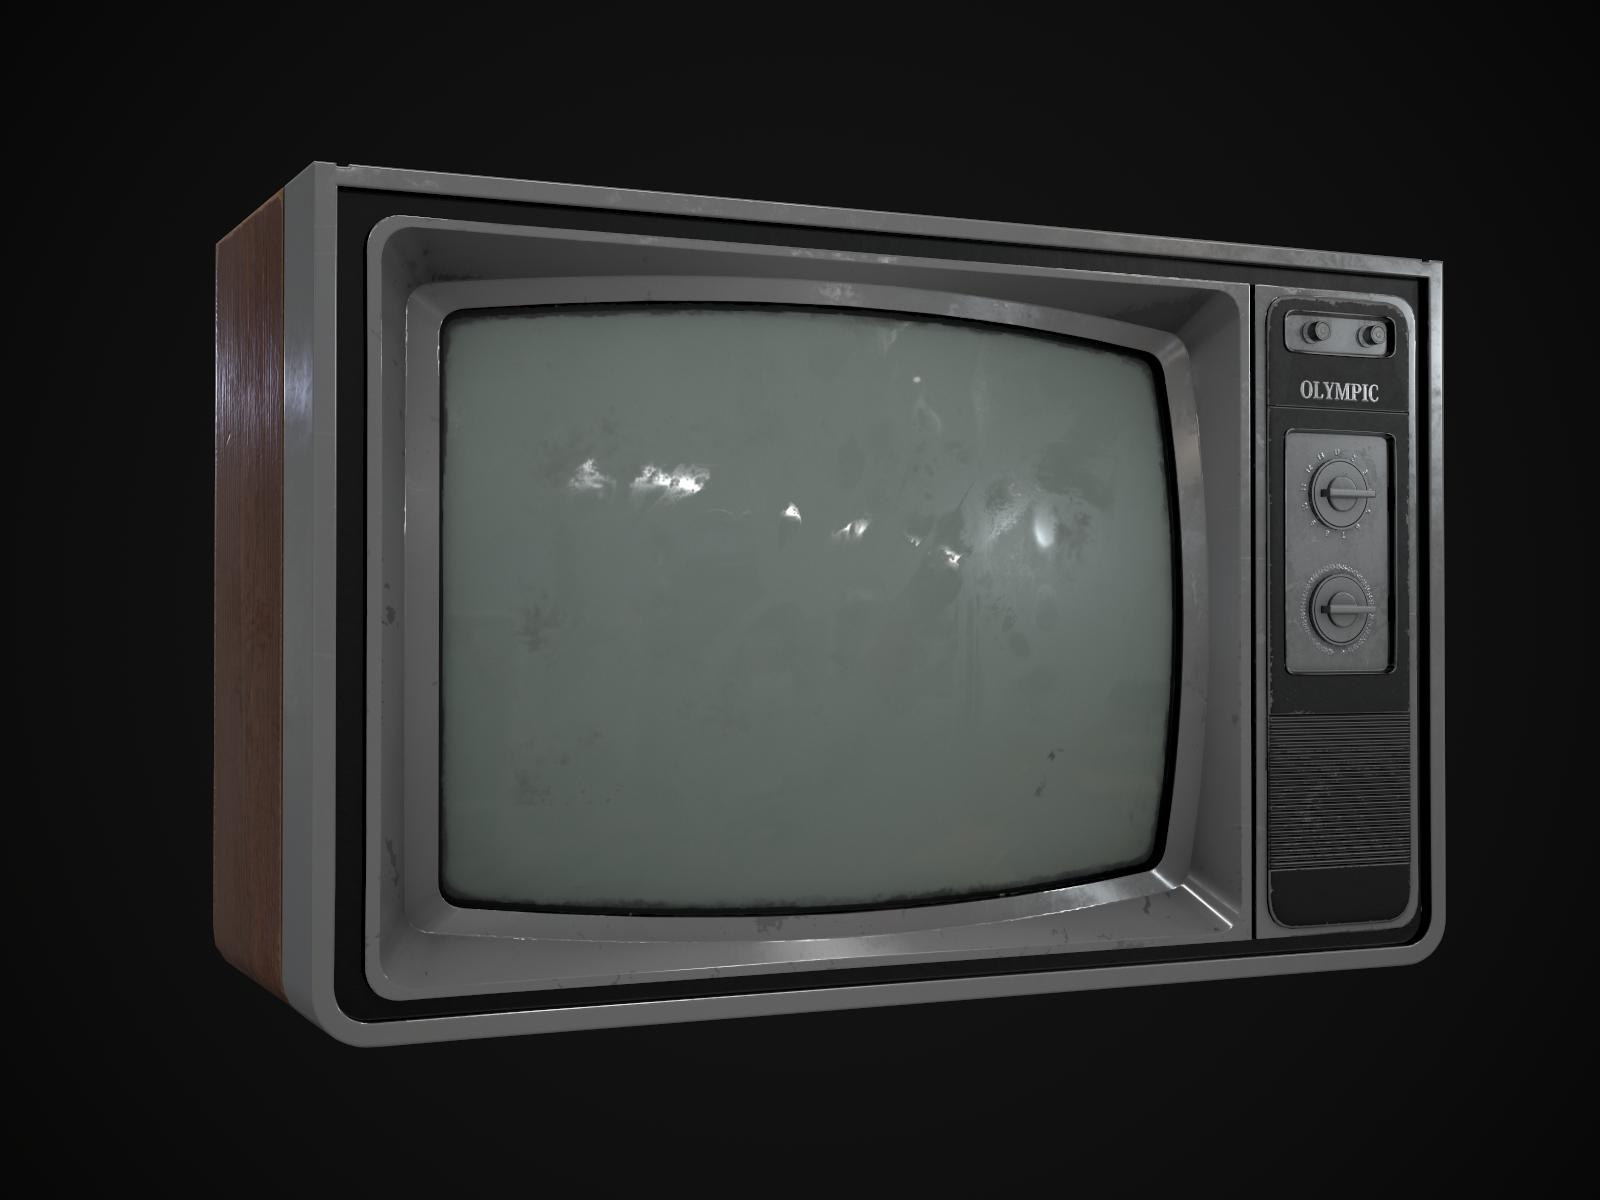 1980's Television — TJ Posluns